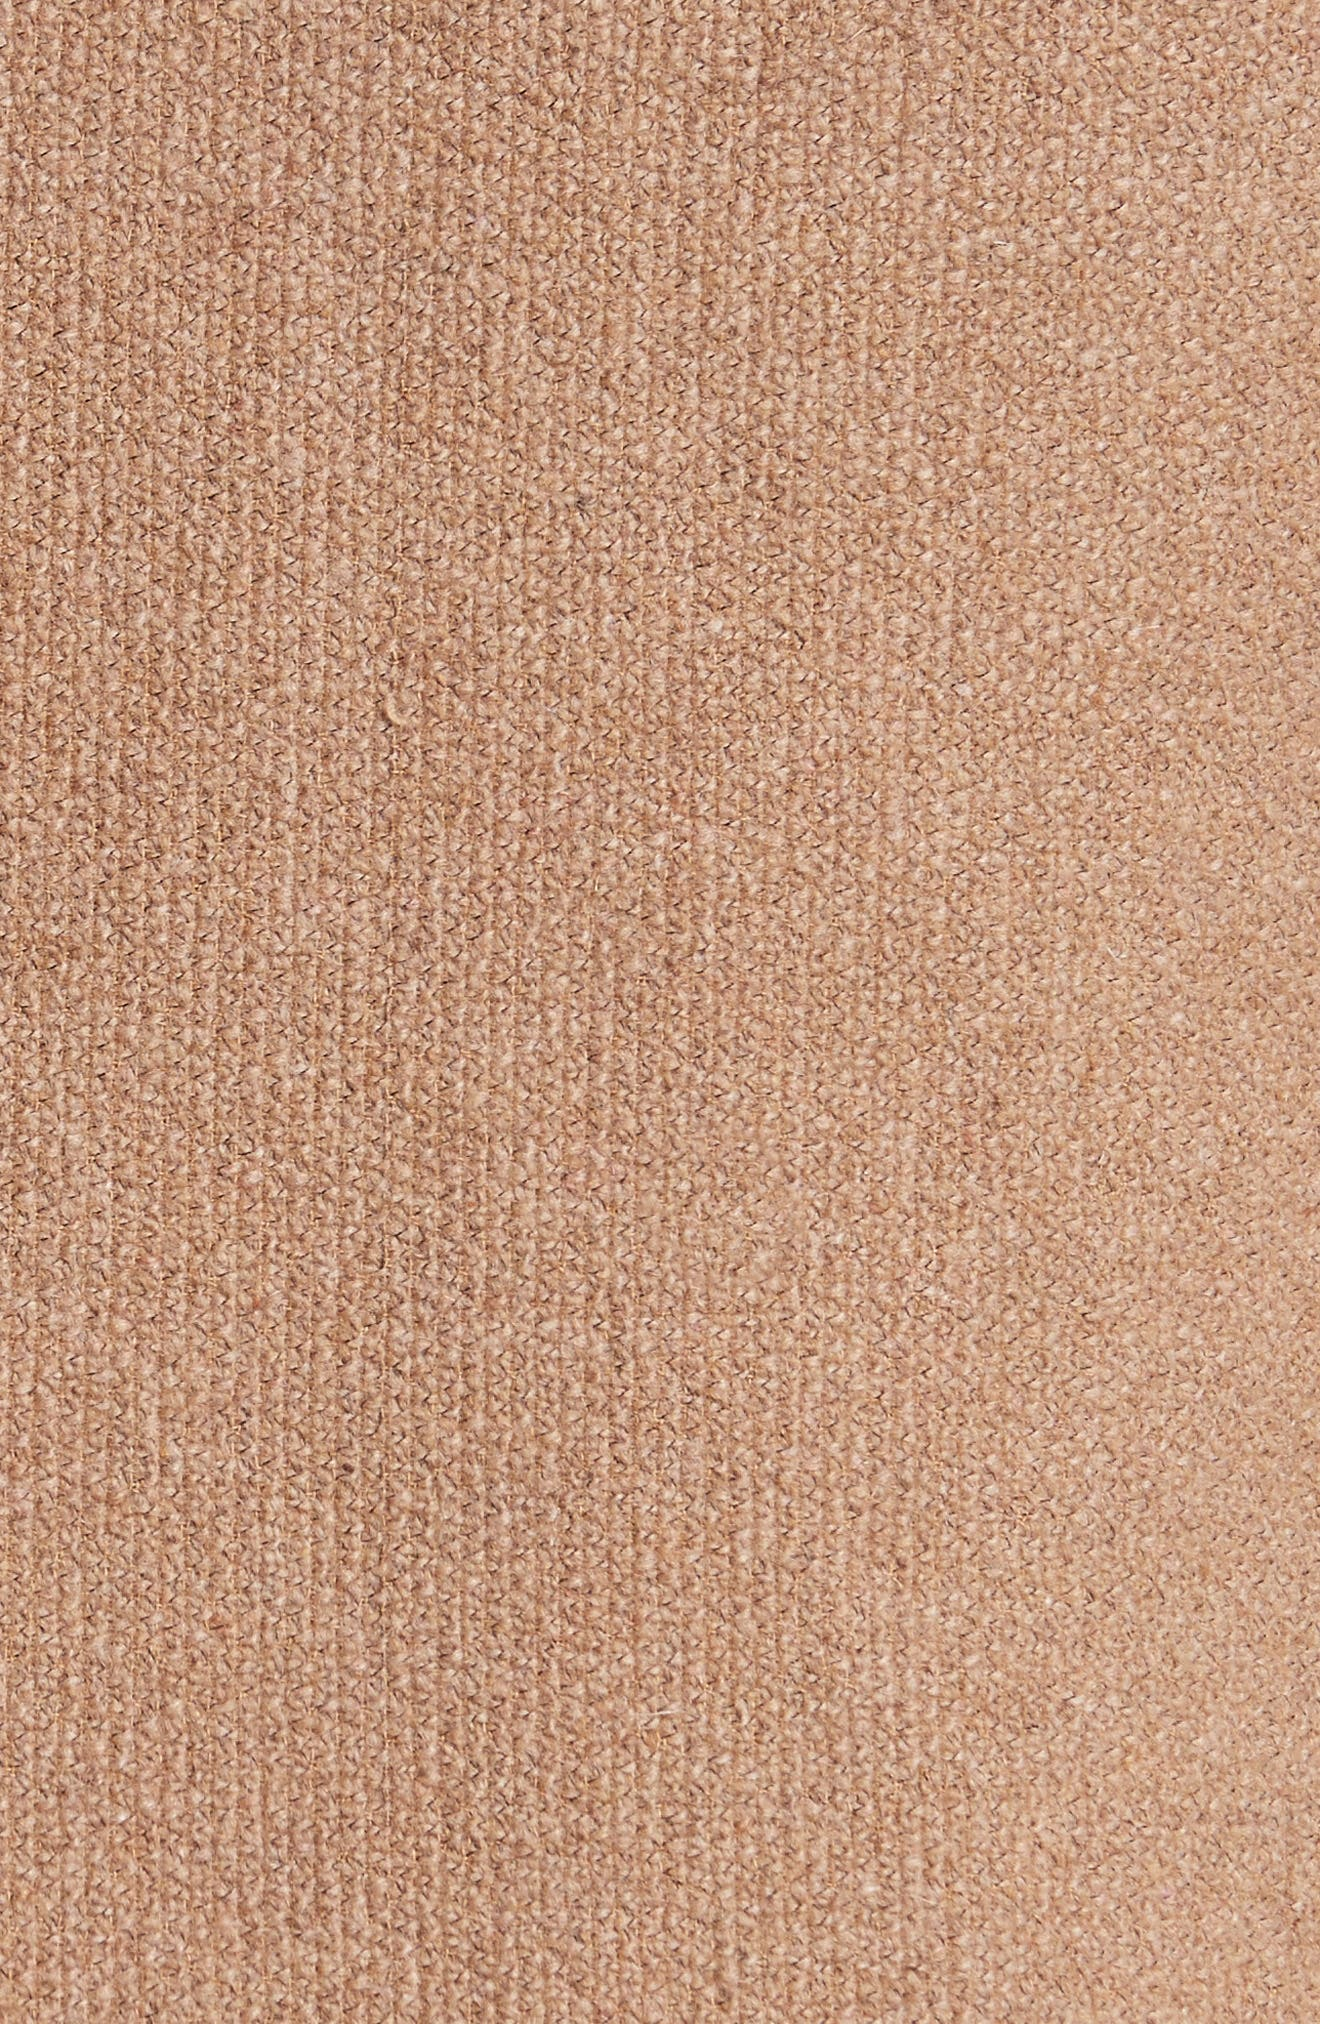 Alternate Image 5  - Eidos Napoli Nicola Camel Knit Wool Blazer